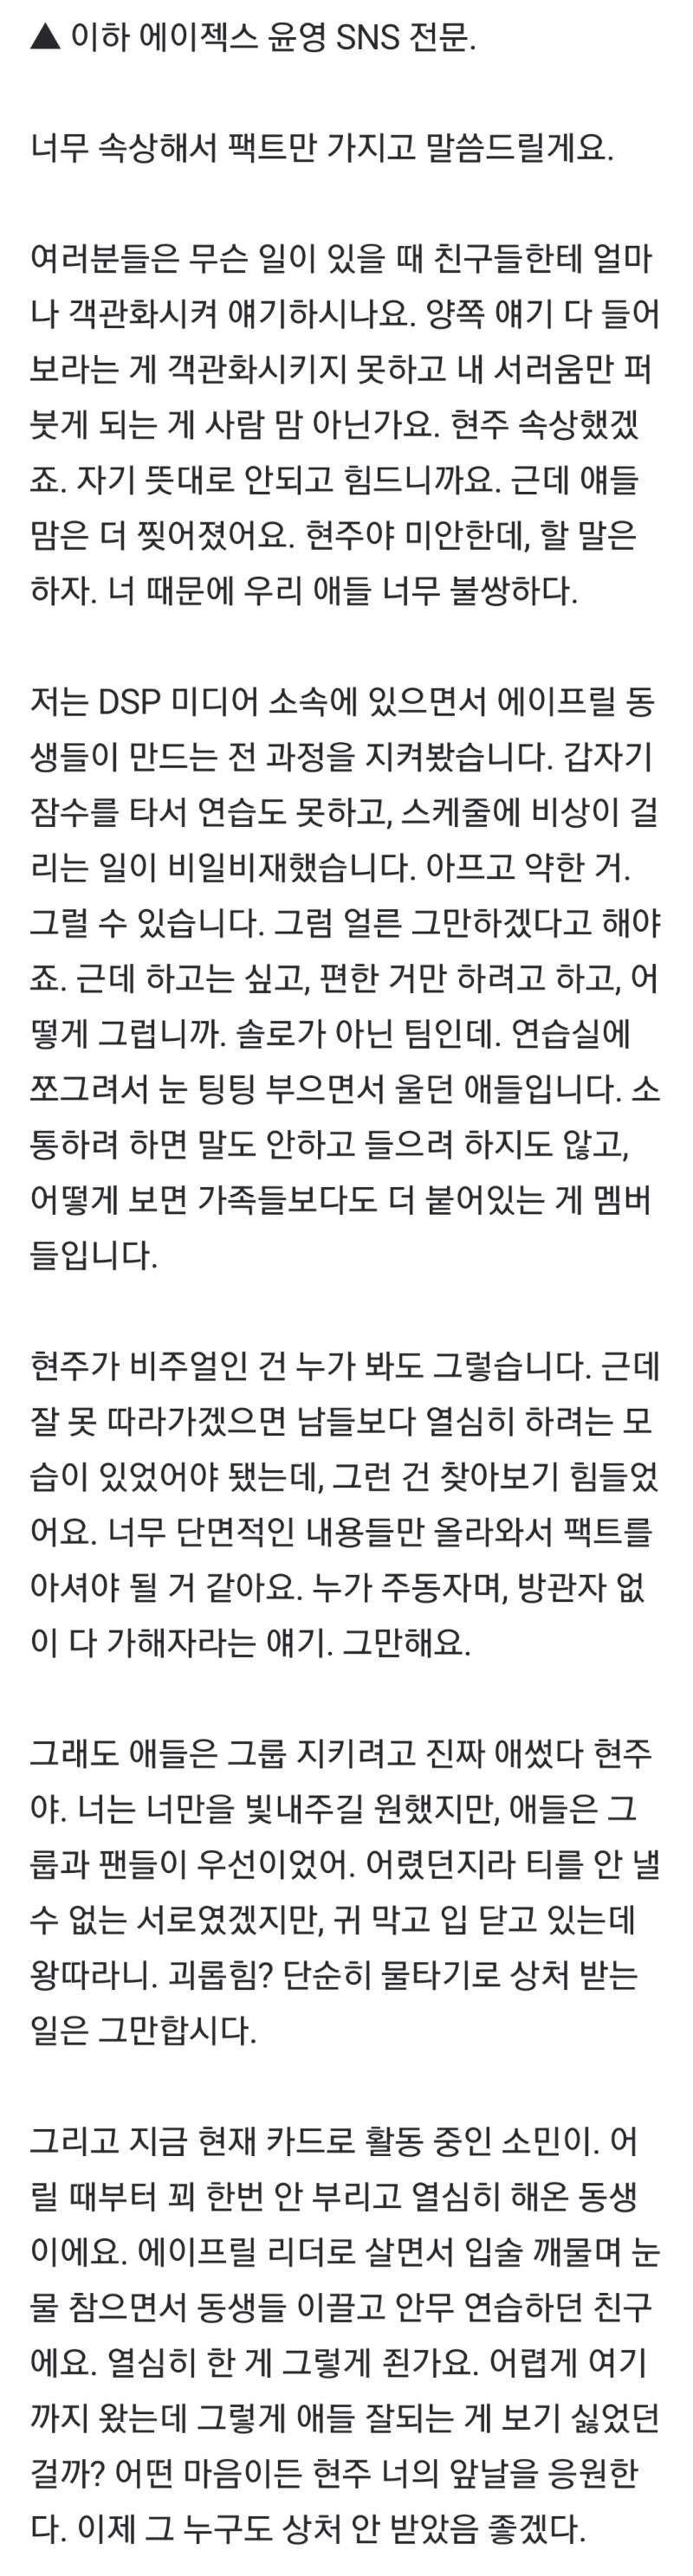 "DSP 출신 윤영 ""현주야 미안한데, 할말은 하자""…이현주 왕따설 반박 | 인스티즈"